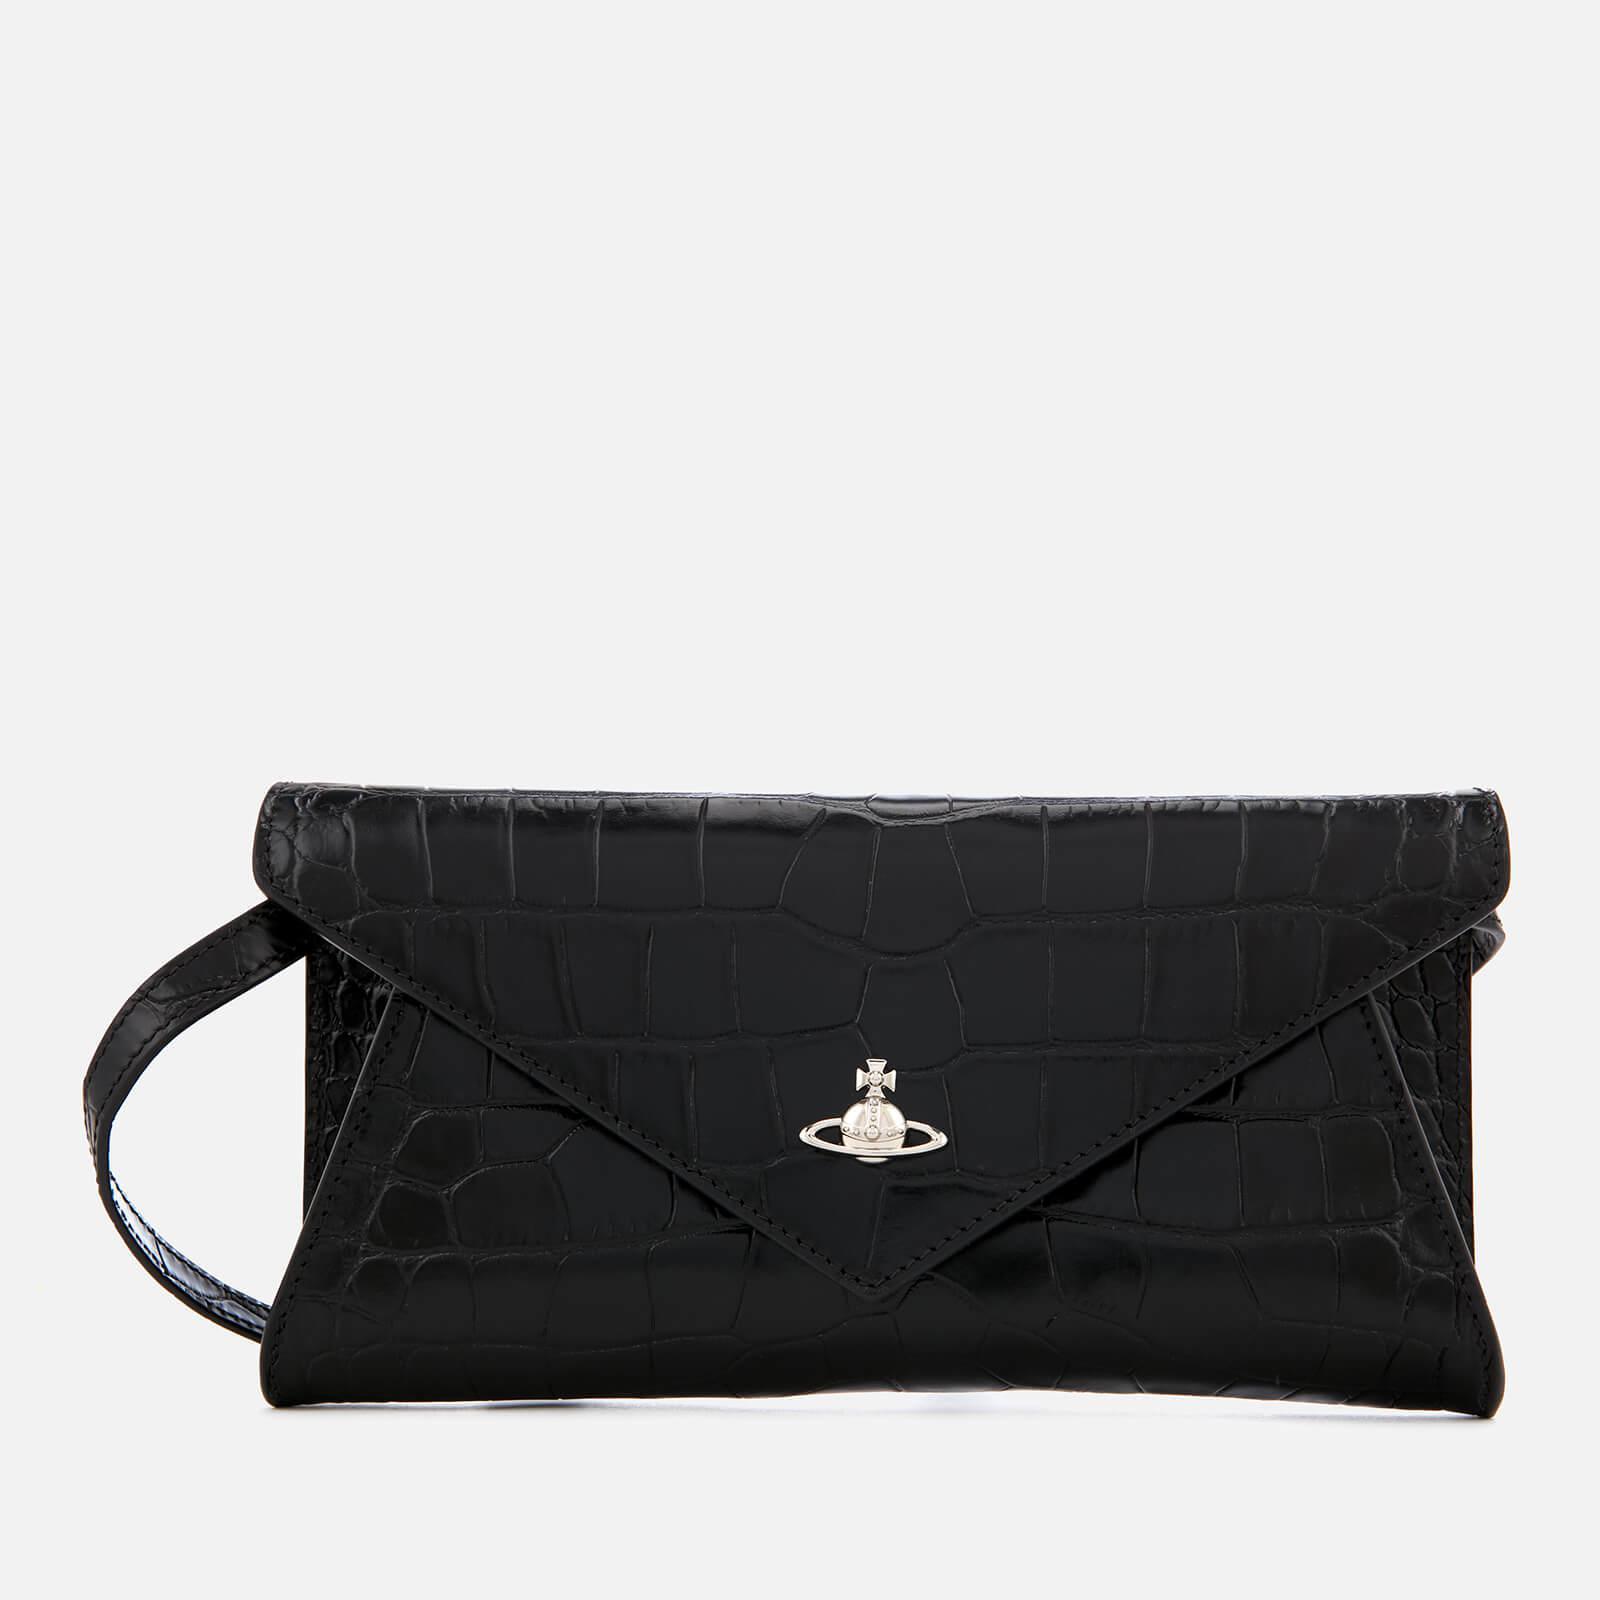 2488e5a061e8 Vivienne Westwood Lisa Envelope Clutch Bag in Black - Save 33% - Lyst